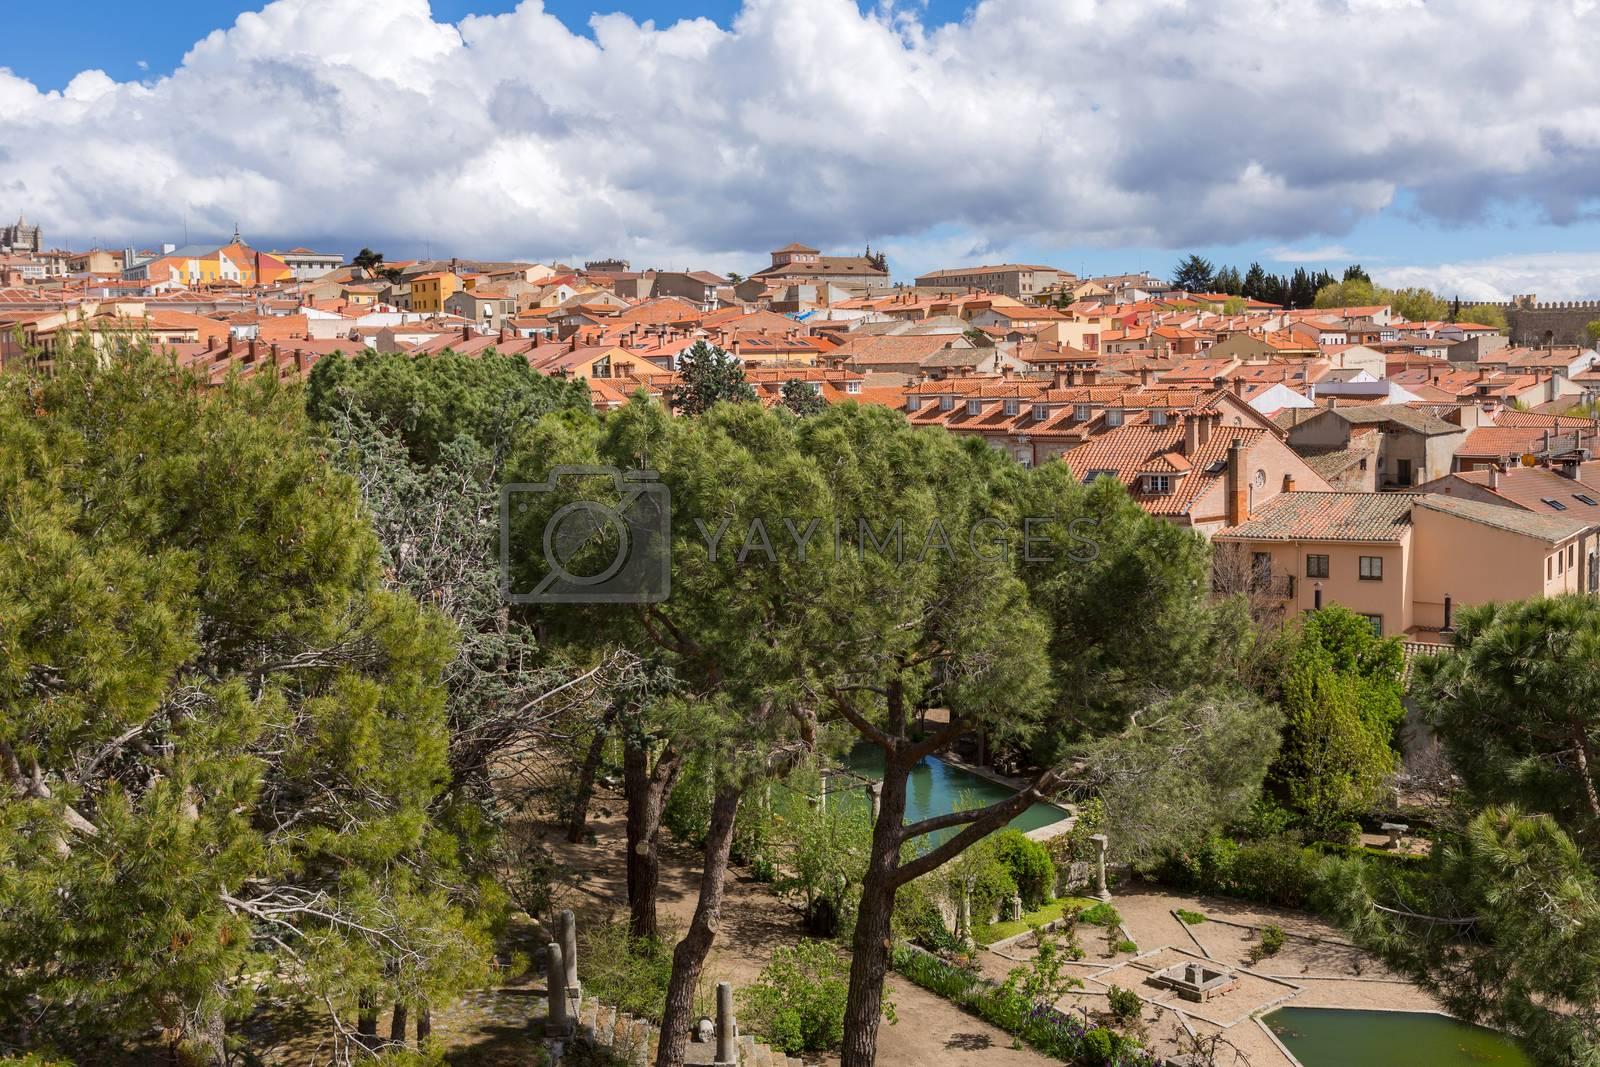 Ancient village of Avila, inside the walls, Castile and Leon, Spain